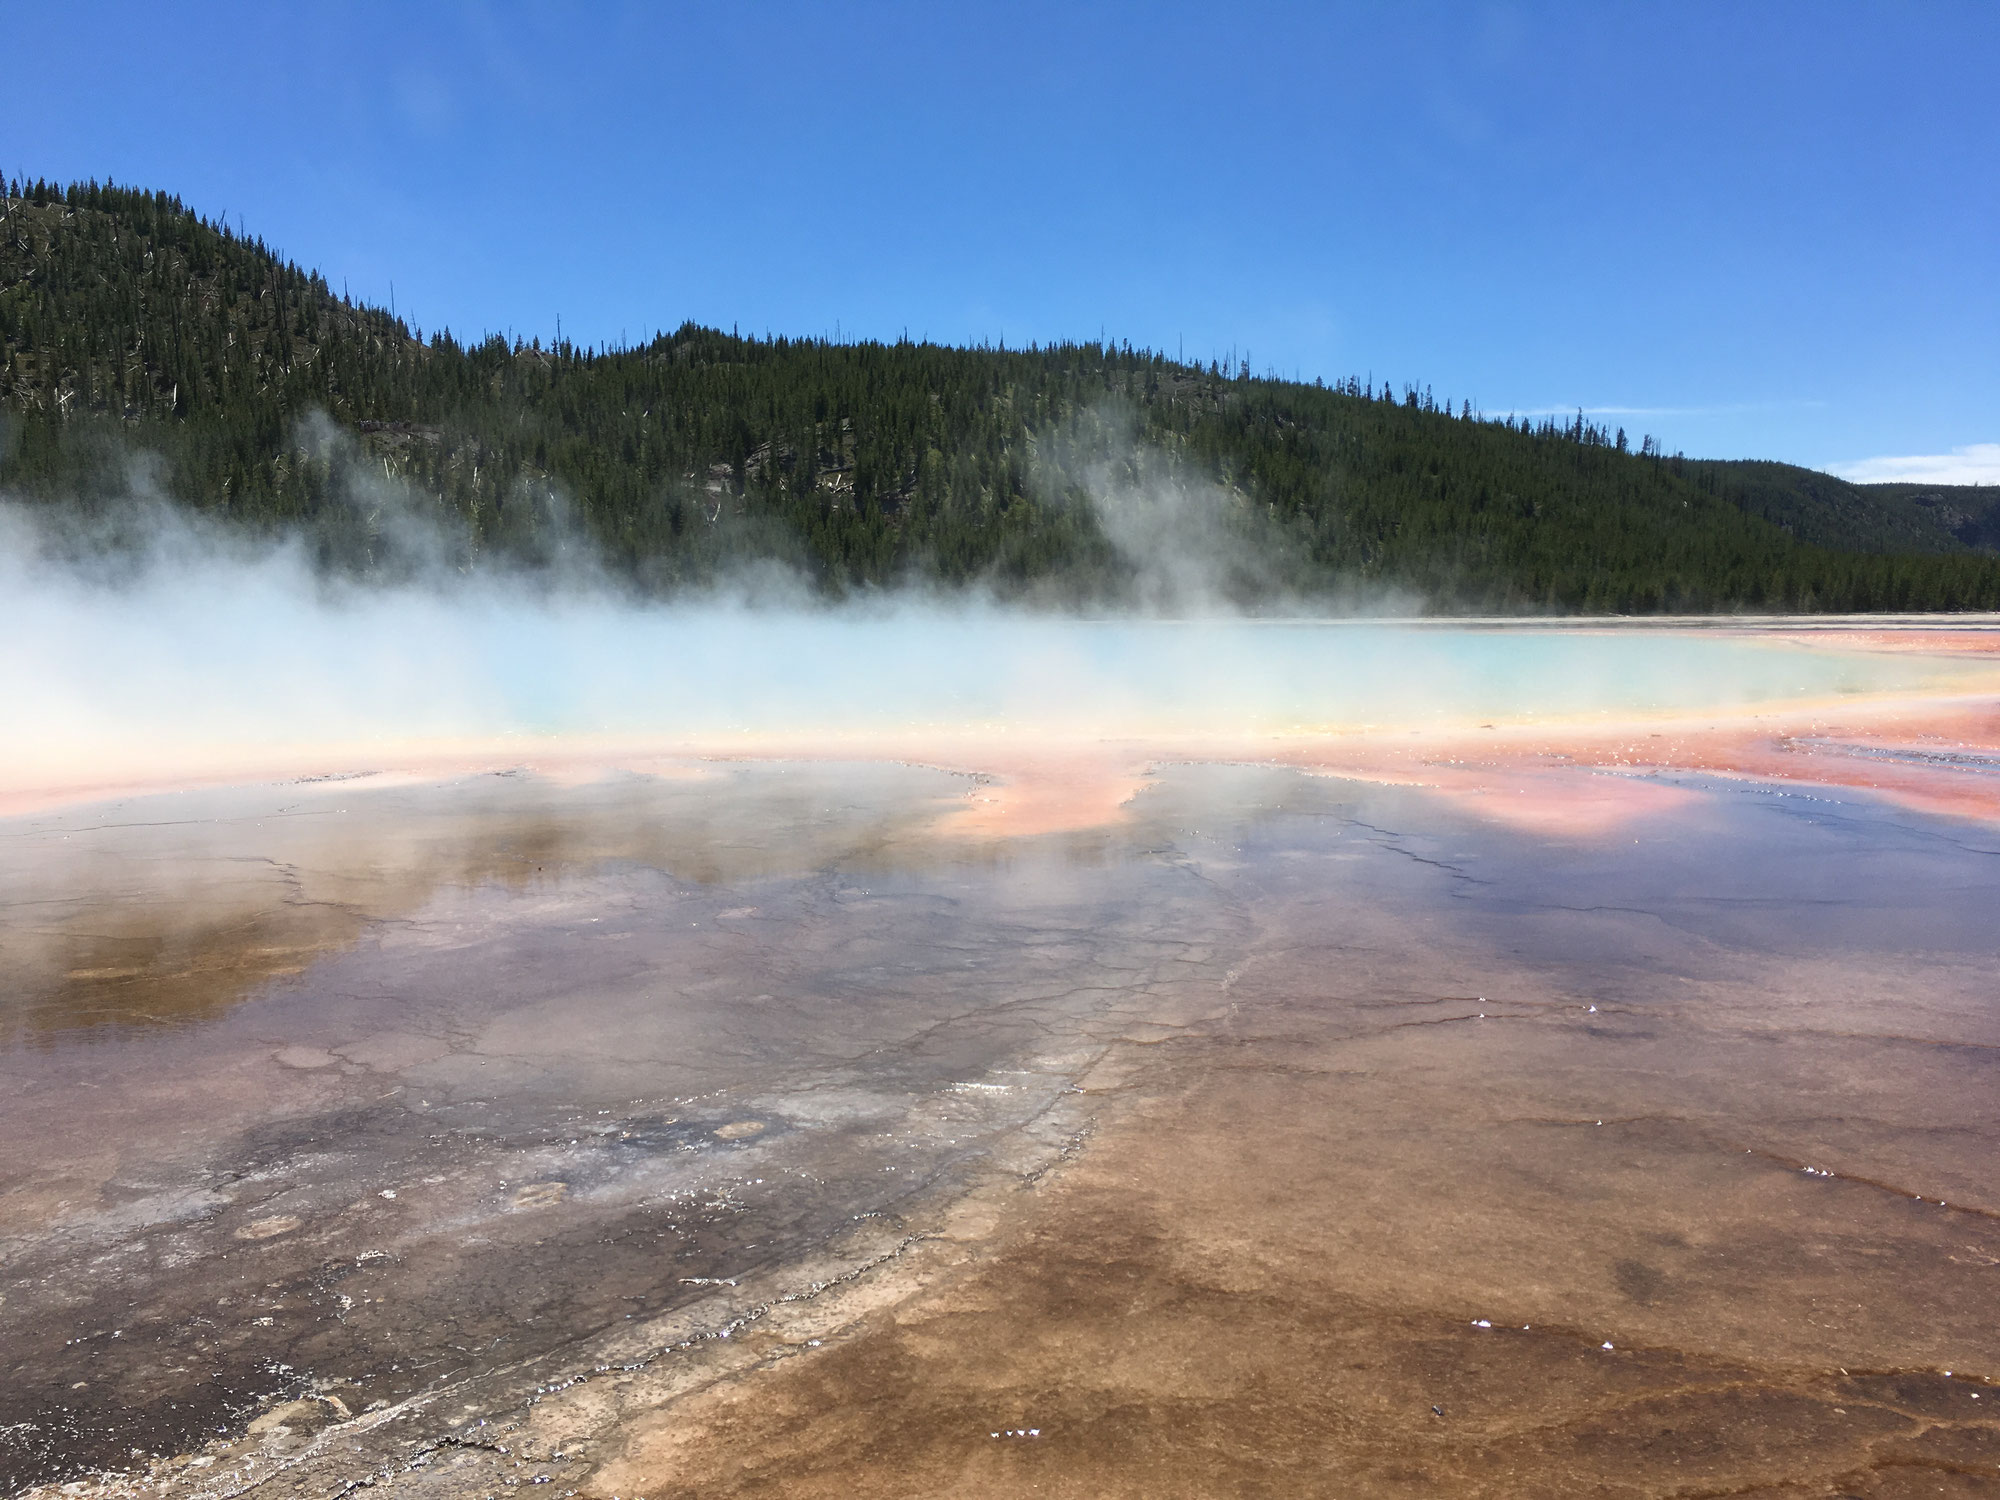 Yellowstone N.P. 16.6. - 26.6.2018